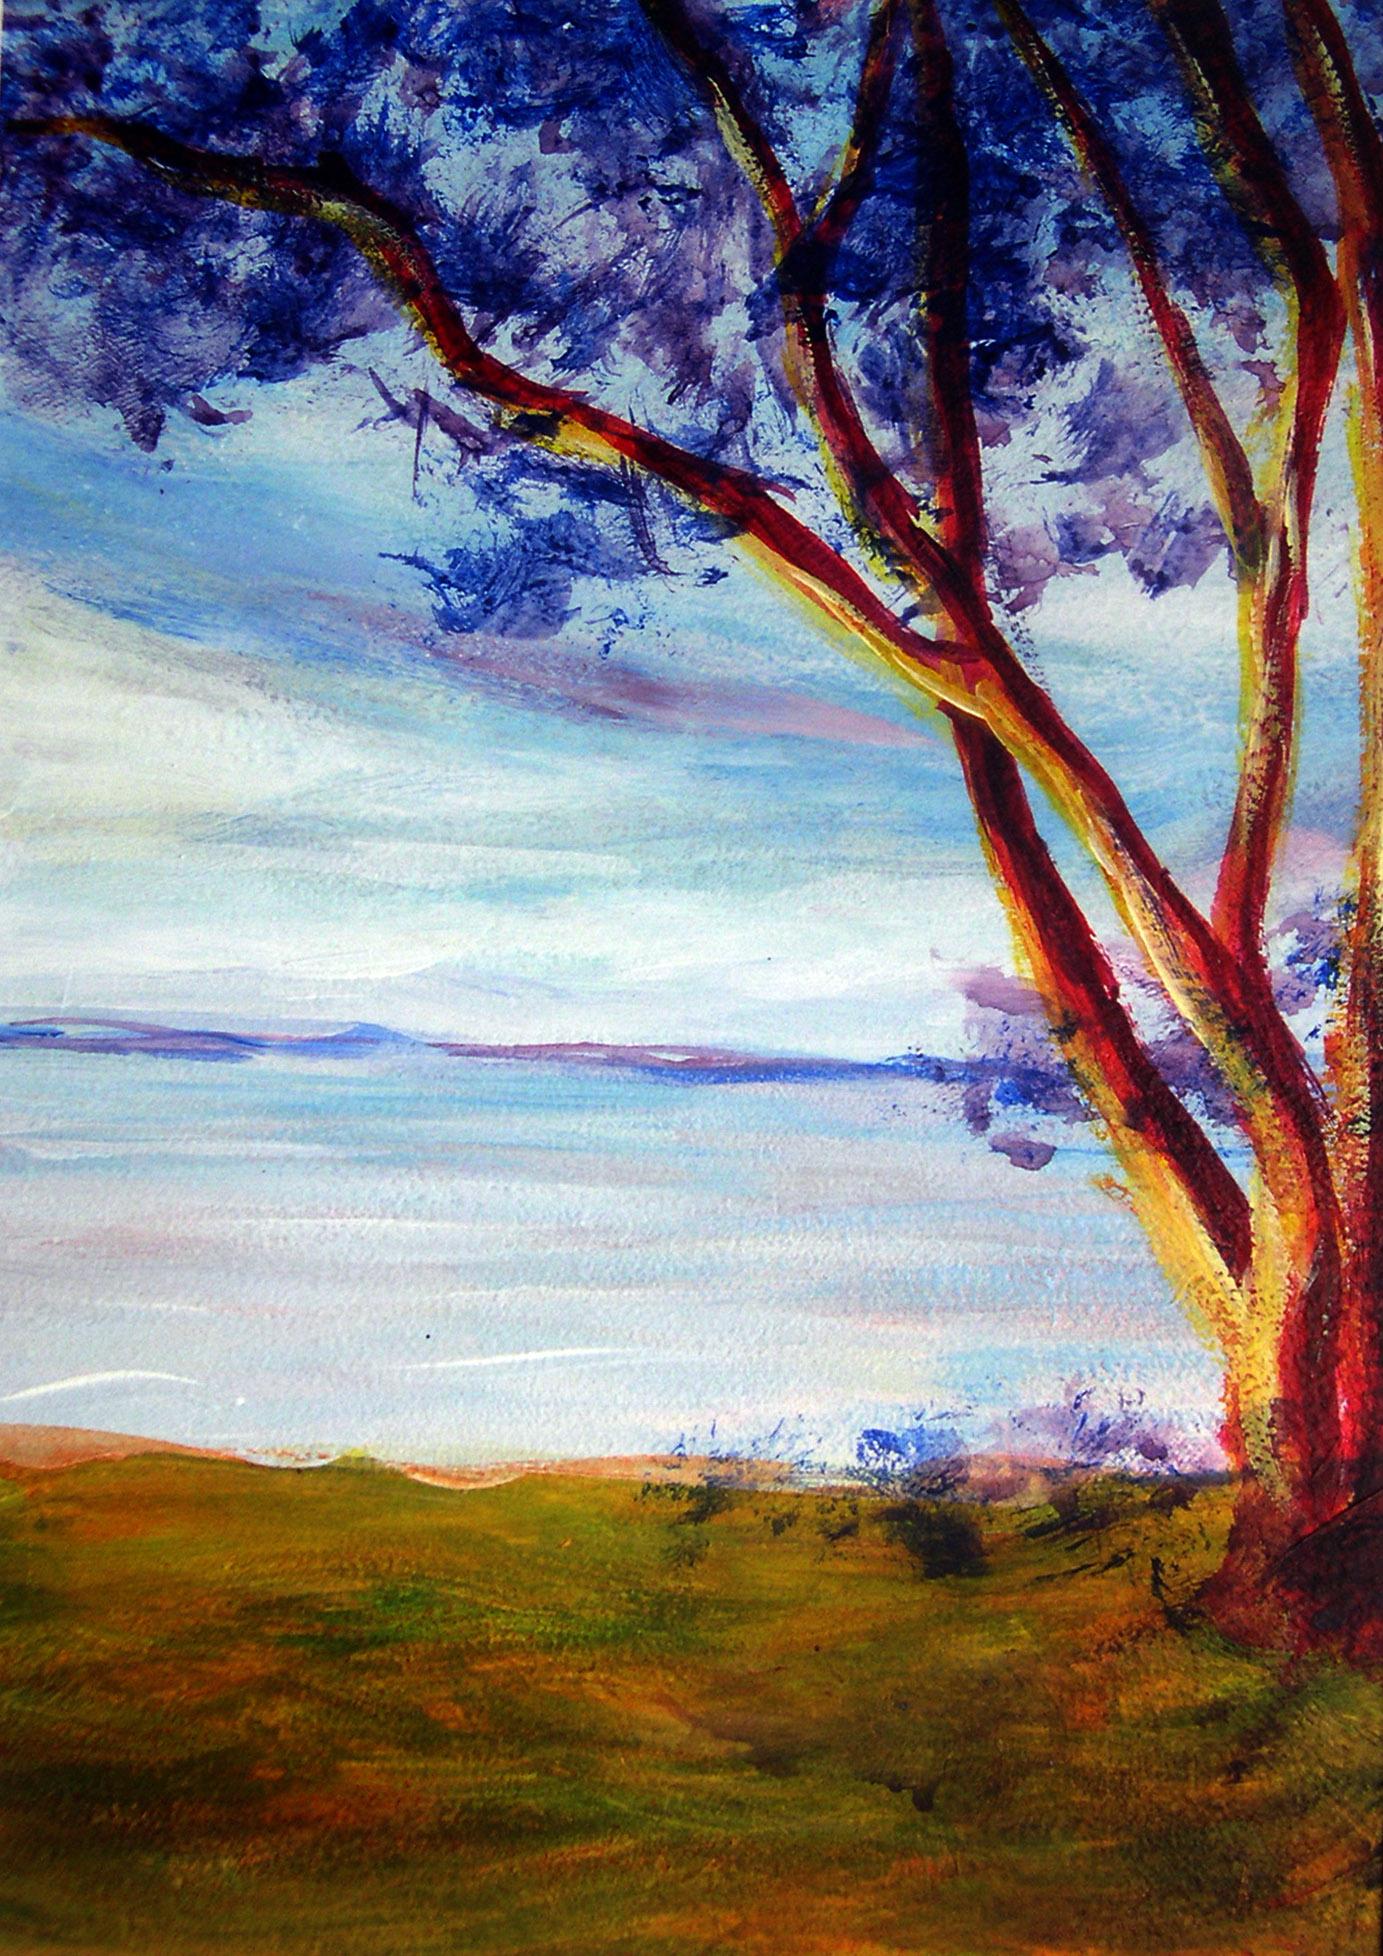 arbol a la orilla - paisaje felicitacion 3-09